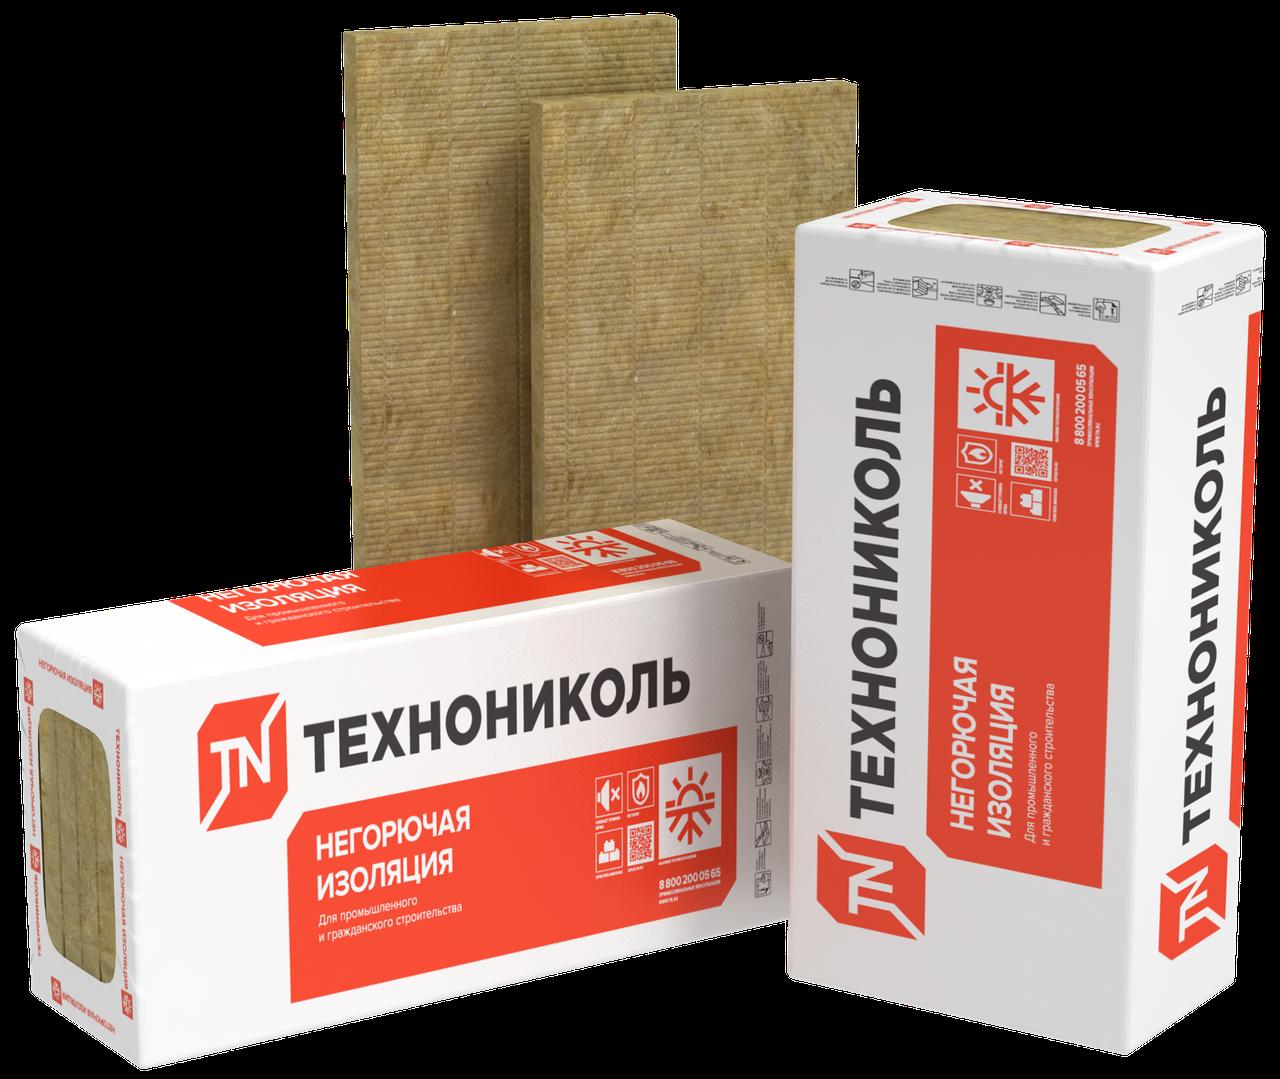 Вата мінеральна Sweetondale Техноруф В Екстра, 175 кг/куб.м 50 мм